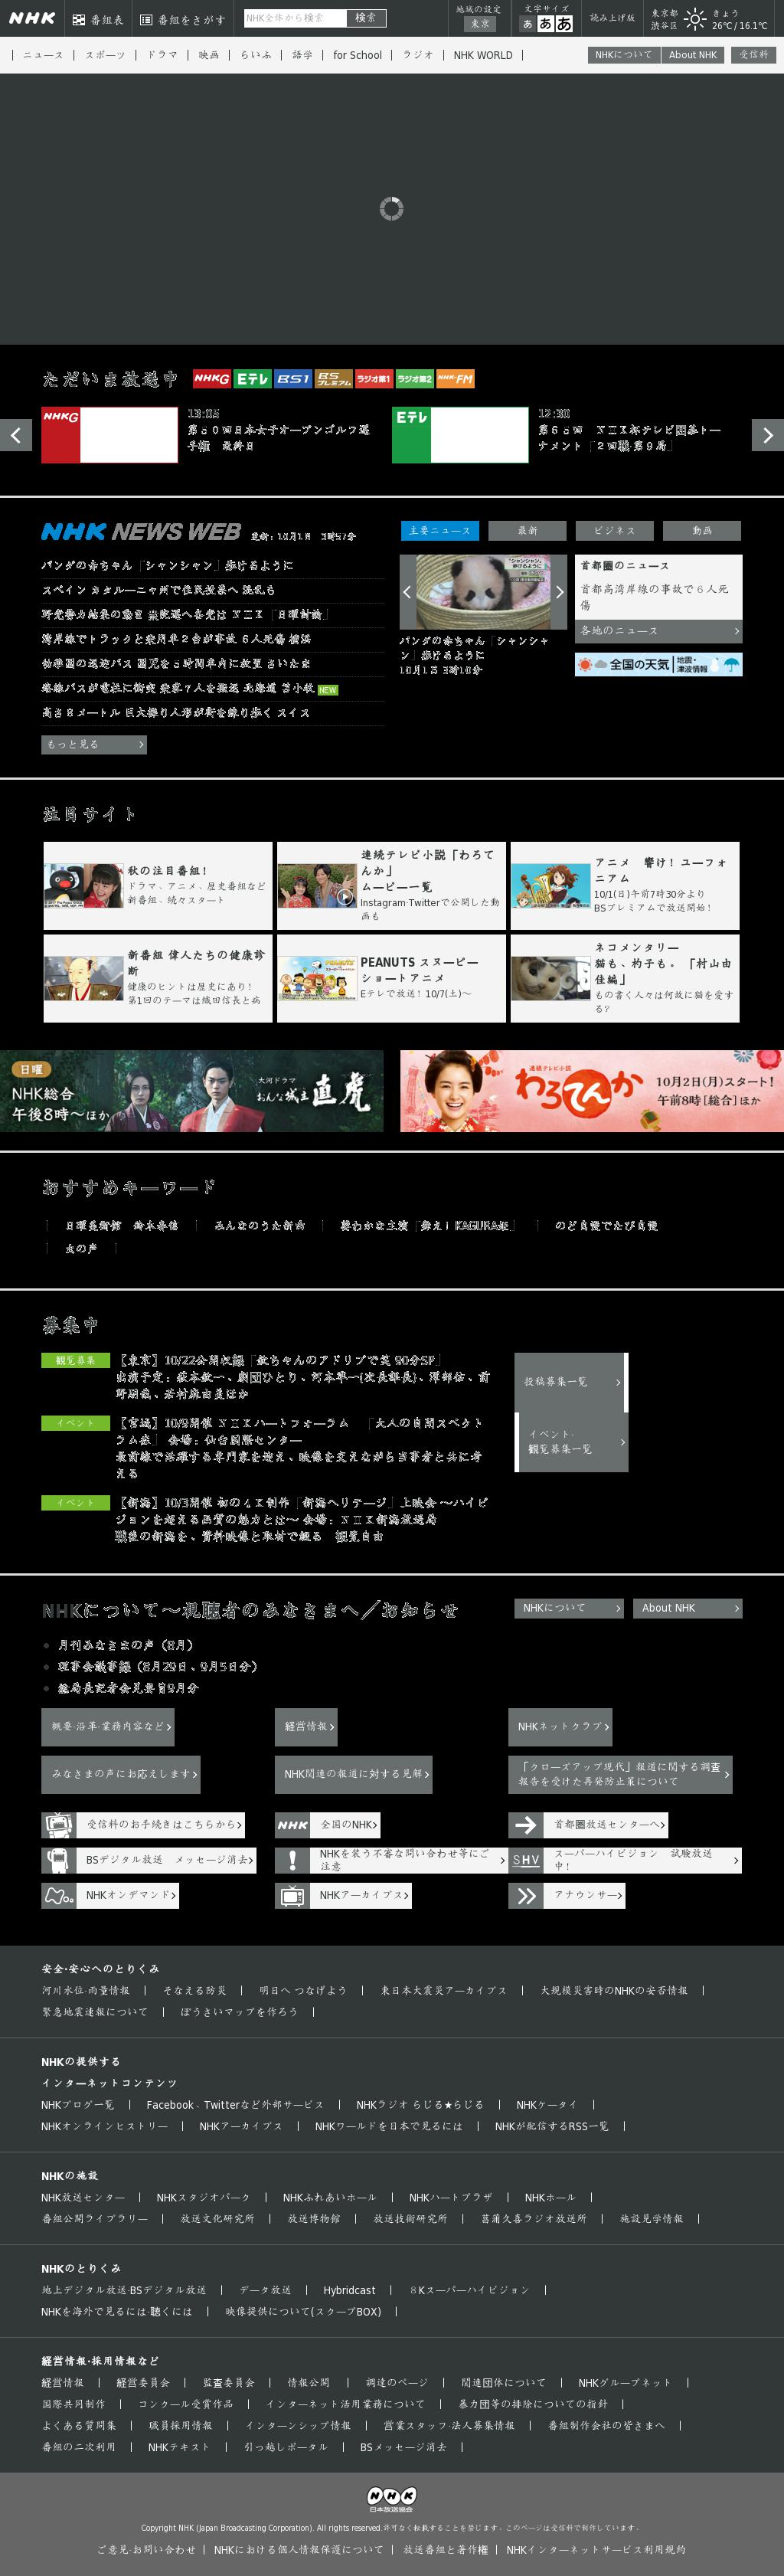 NHK Online at Sunday Oct. 1, 2017, 4:08 a.m. UTC